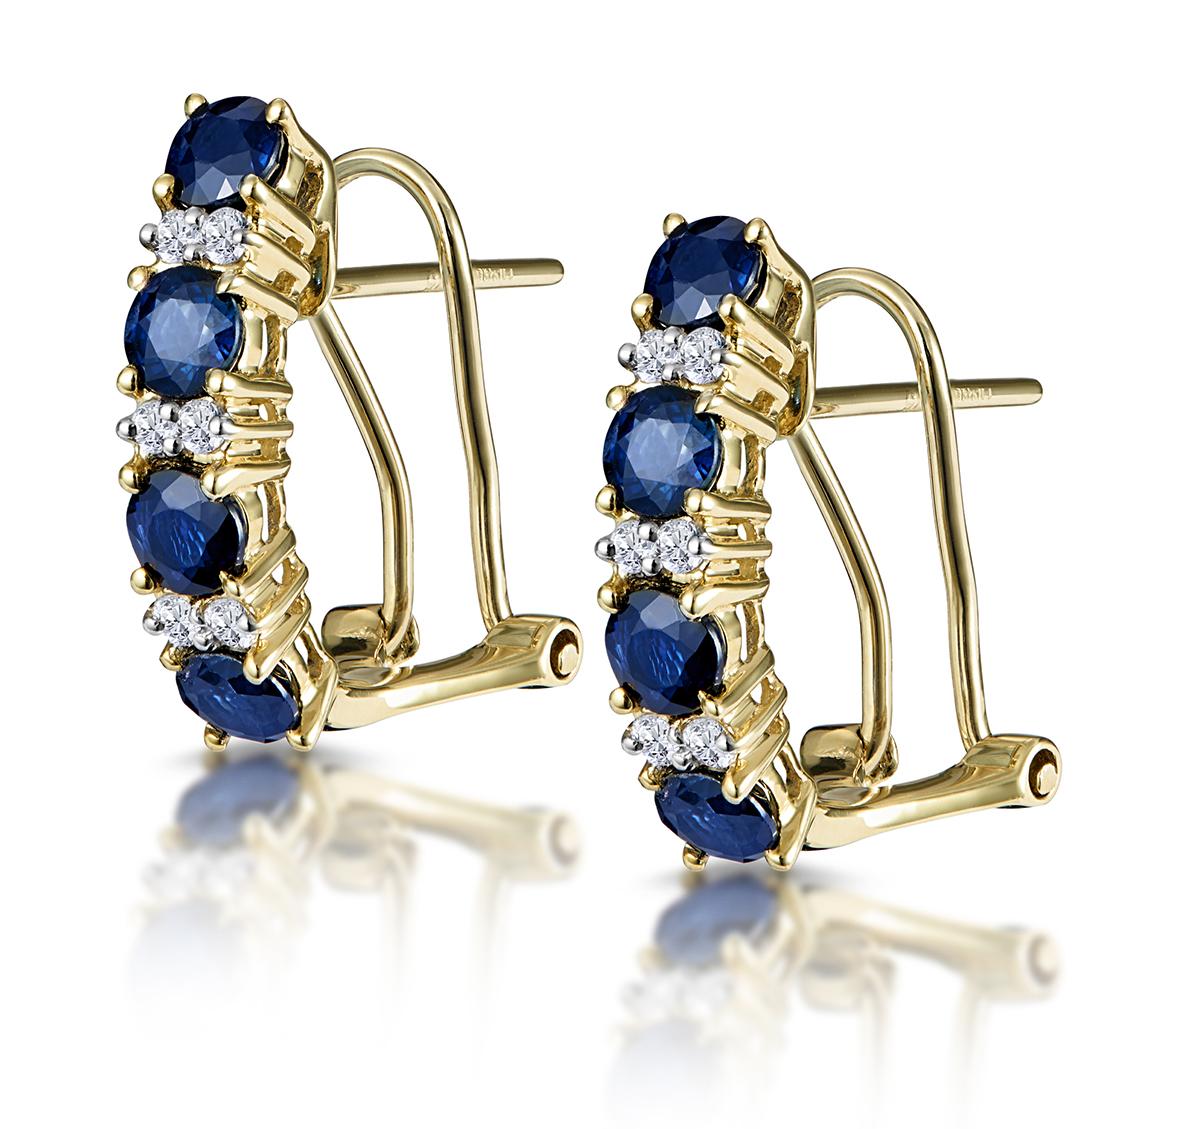 Sapphire 1.45CT And Diamond 9K Yellow Gold Earrings